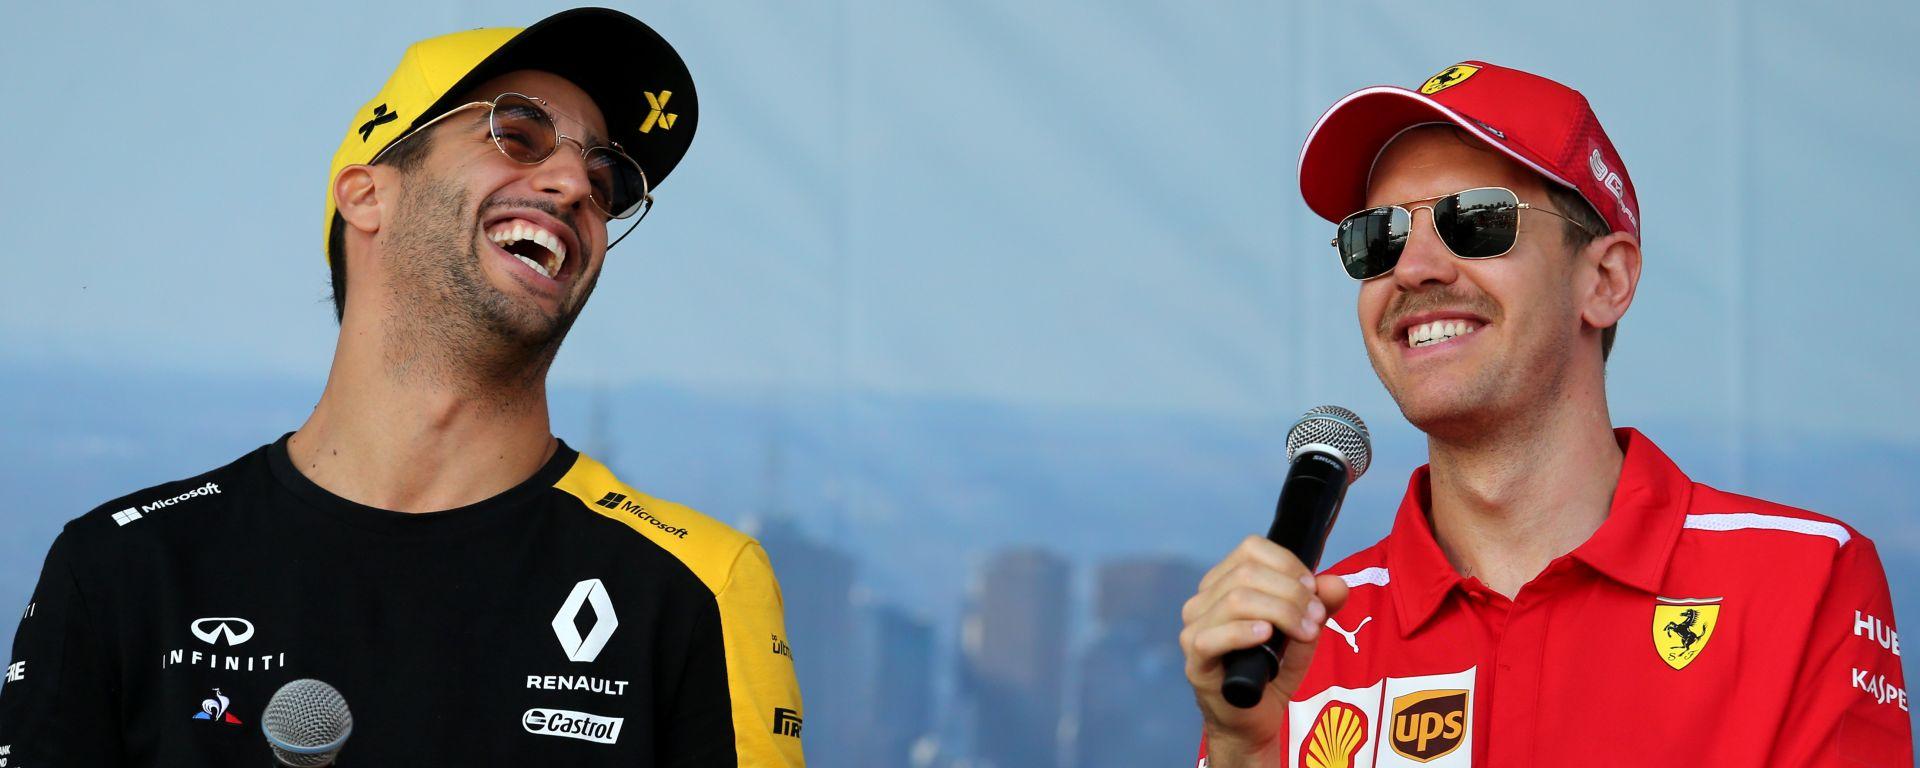 F1 2020: Daniel Ricciardo (Renault) e Sebastian Vettel (Ferrari)